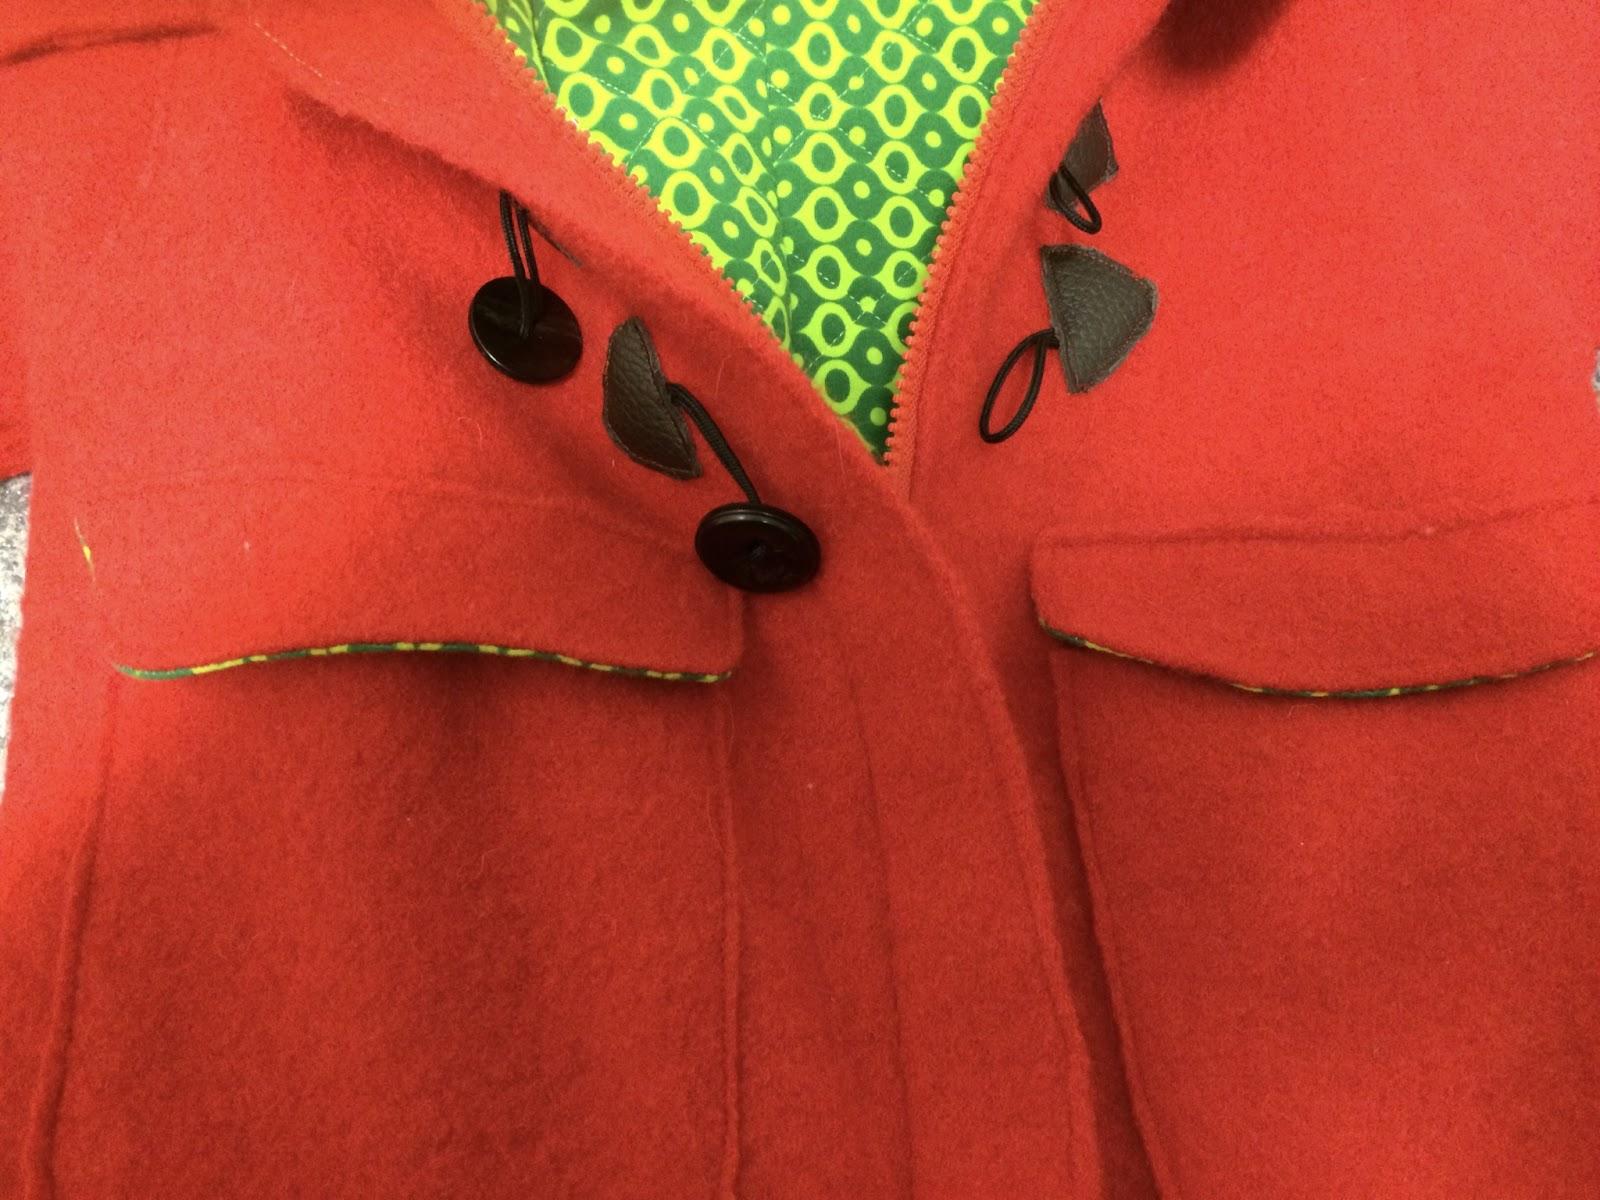 UnikatUli: Roter Dufflecoat -- Eigenkreation